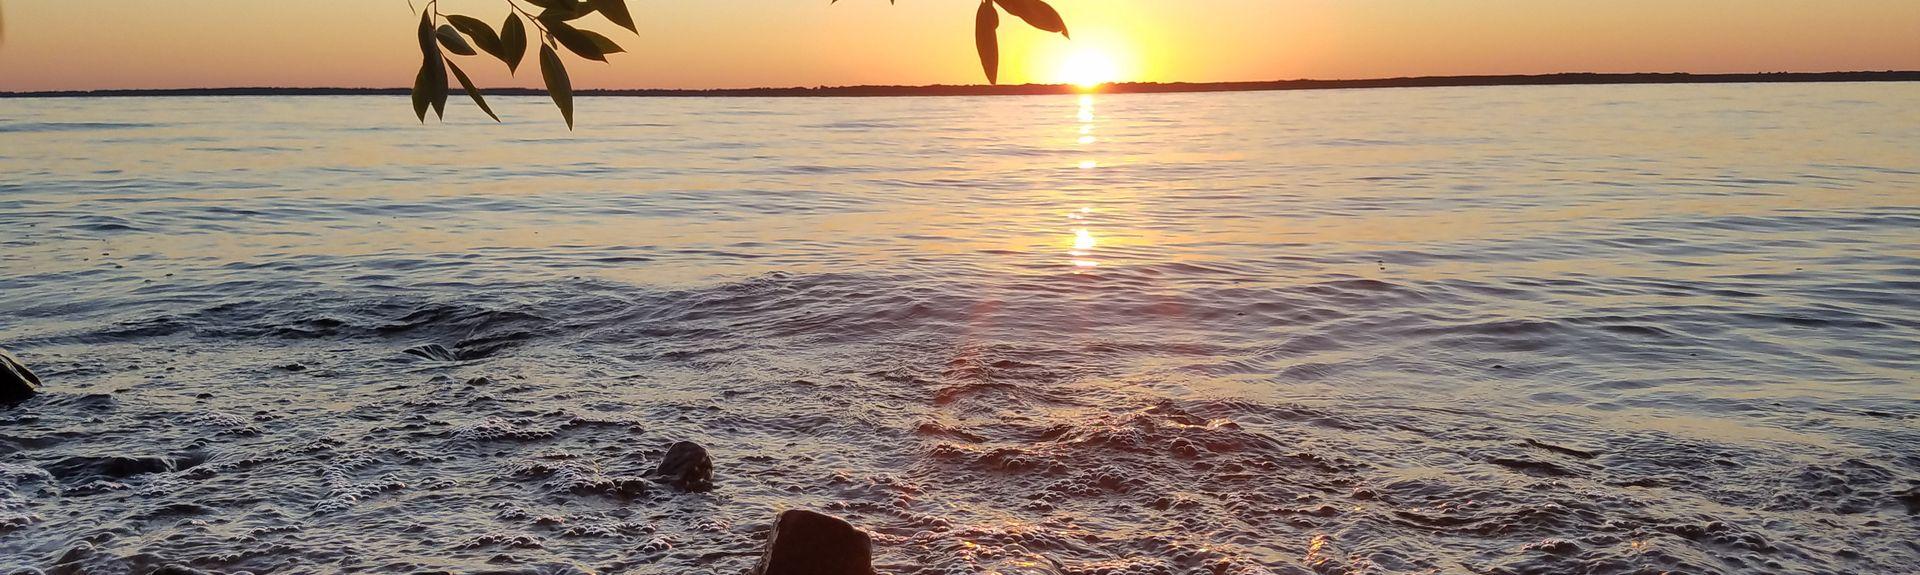 Glacial Lake Cranberries, Wisconsin Rapids, WI, USA